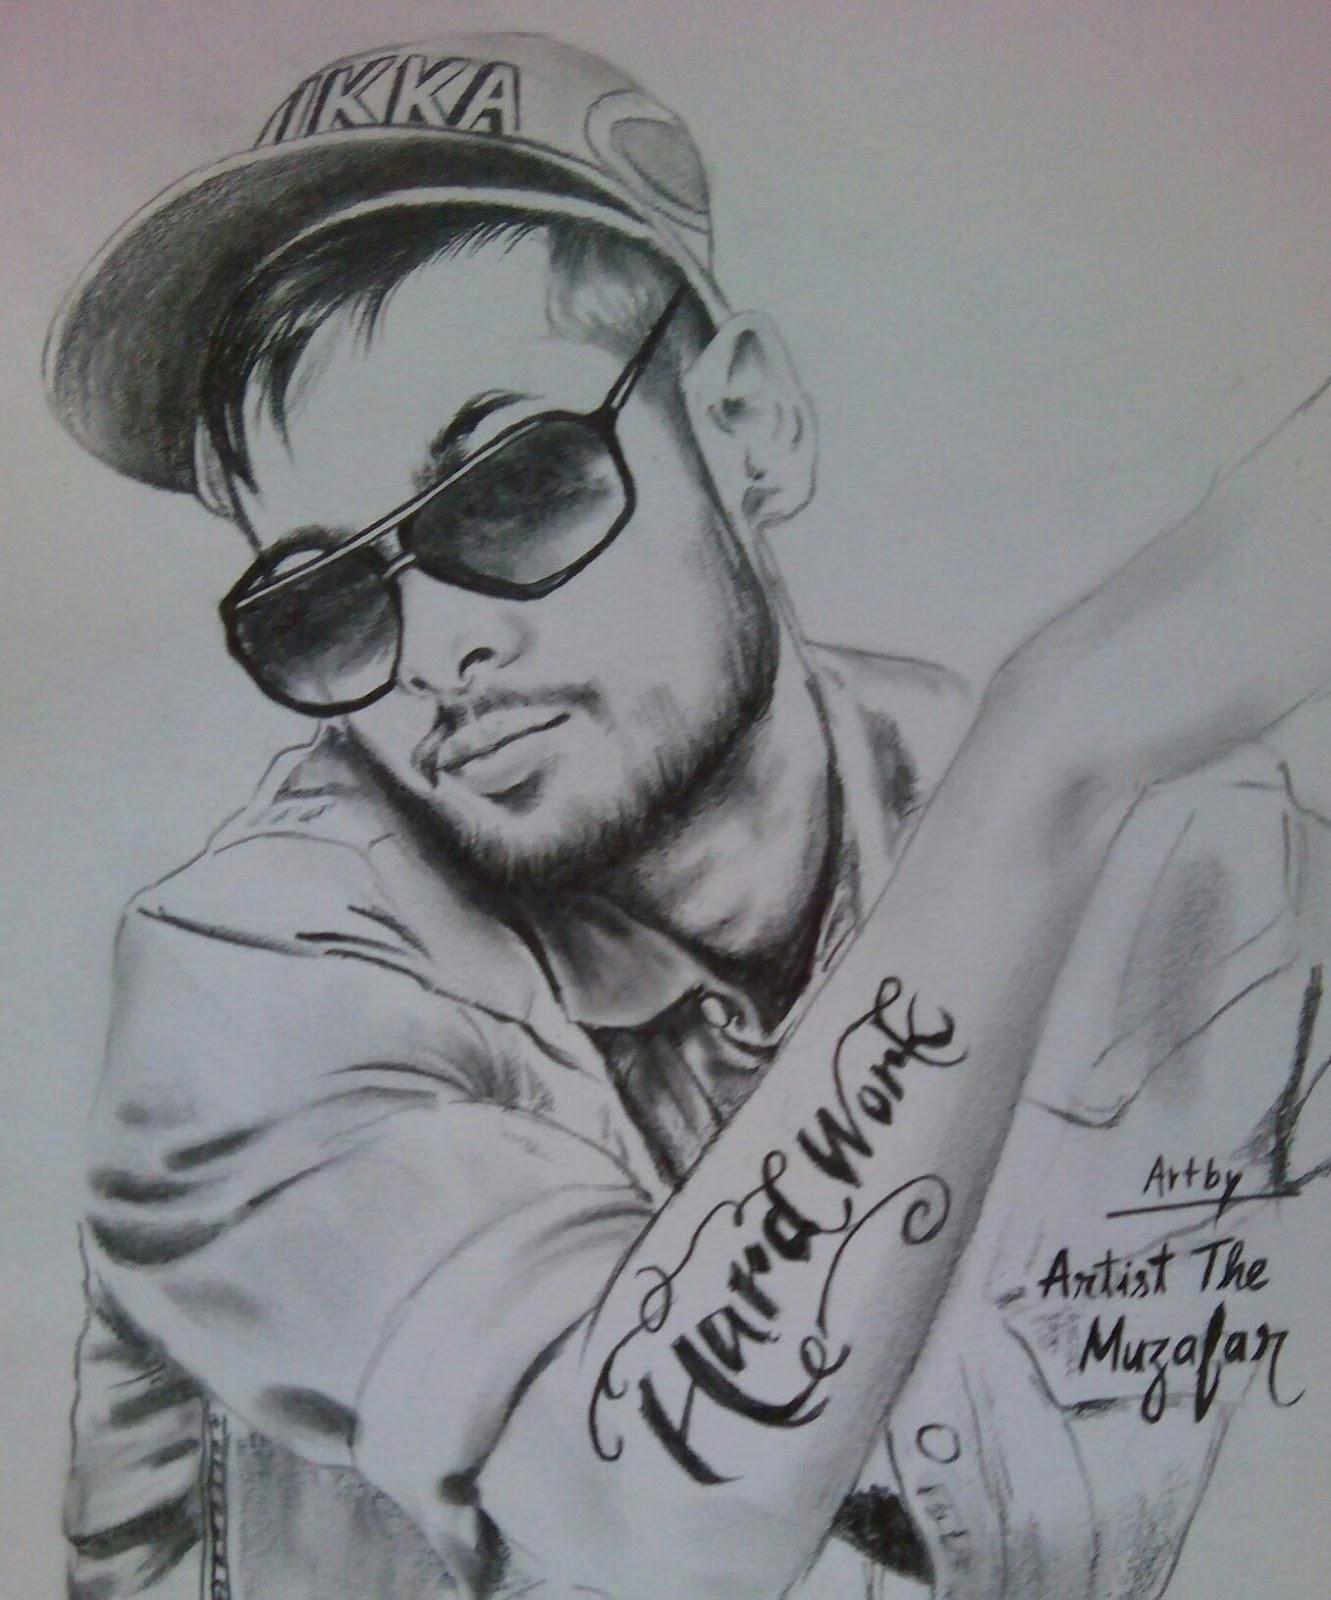 Artist The Muzafar September 2014